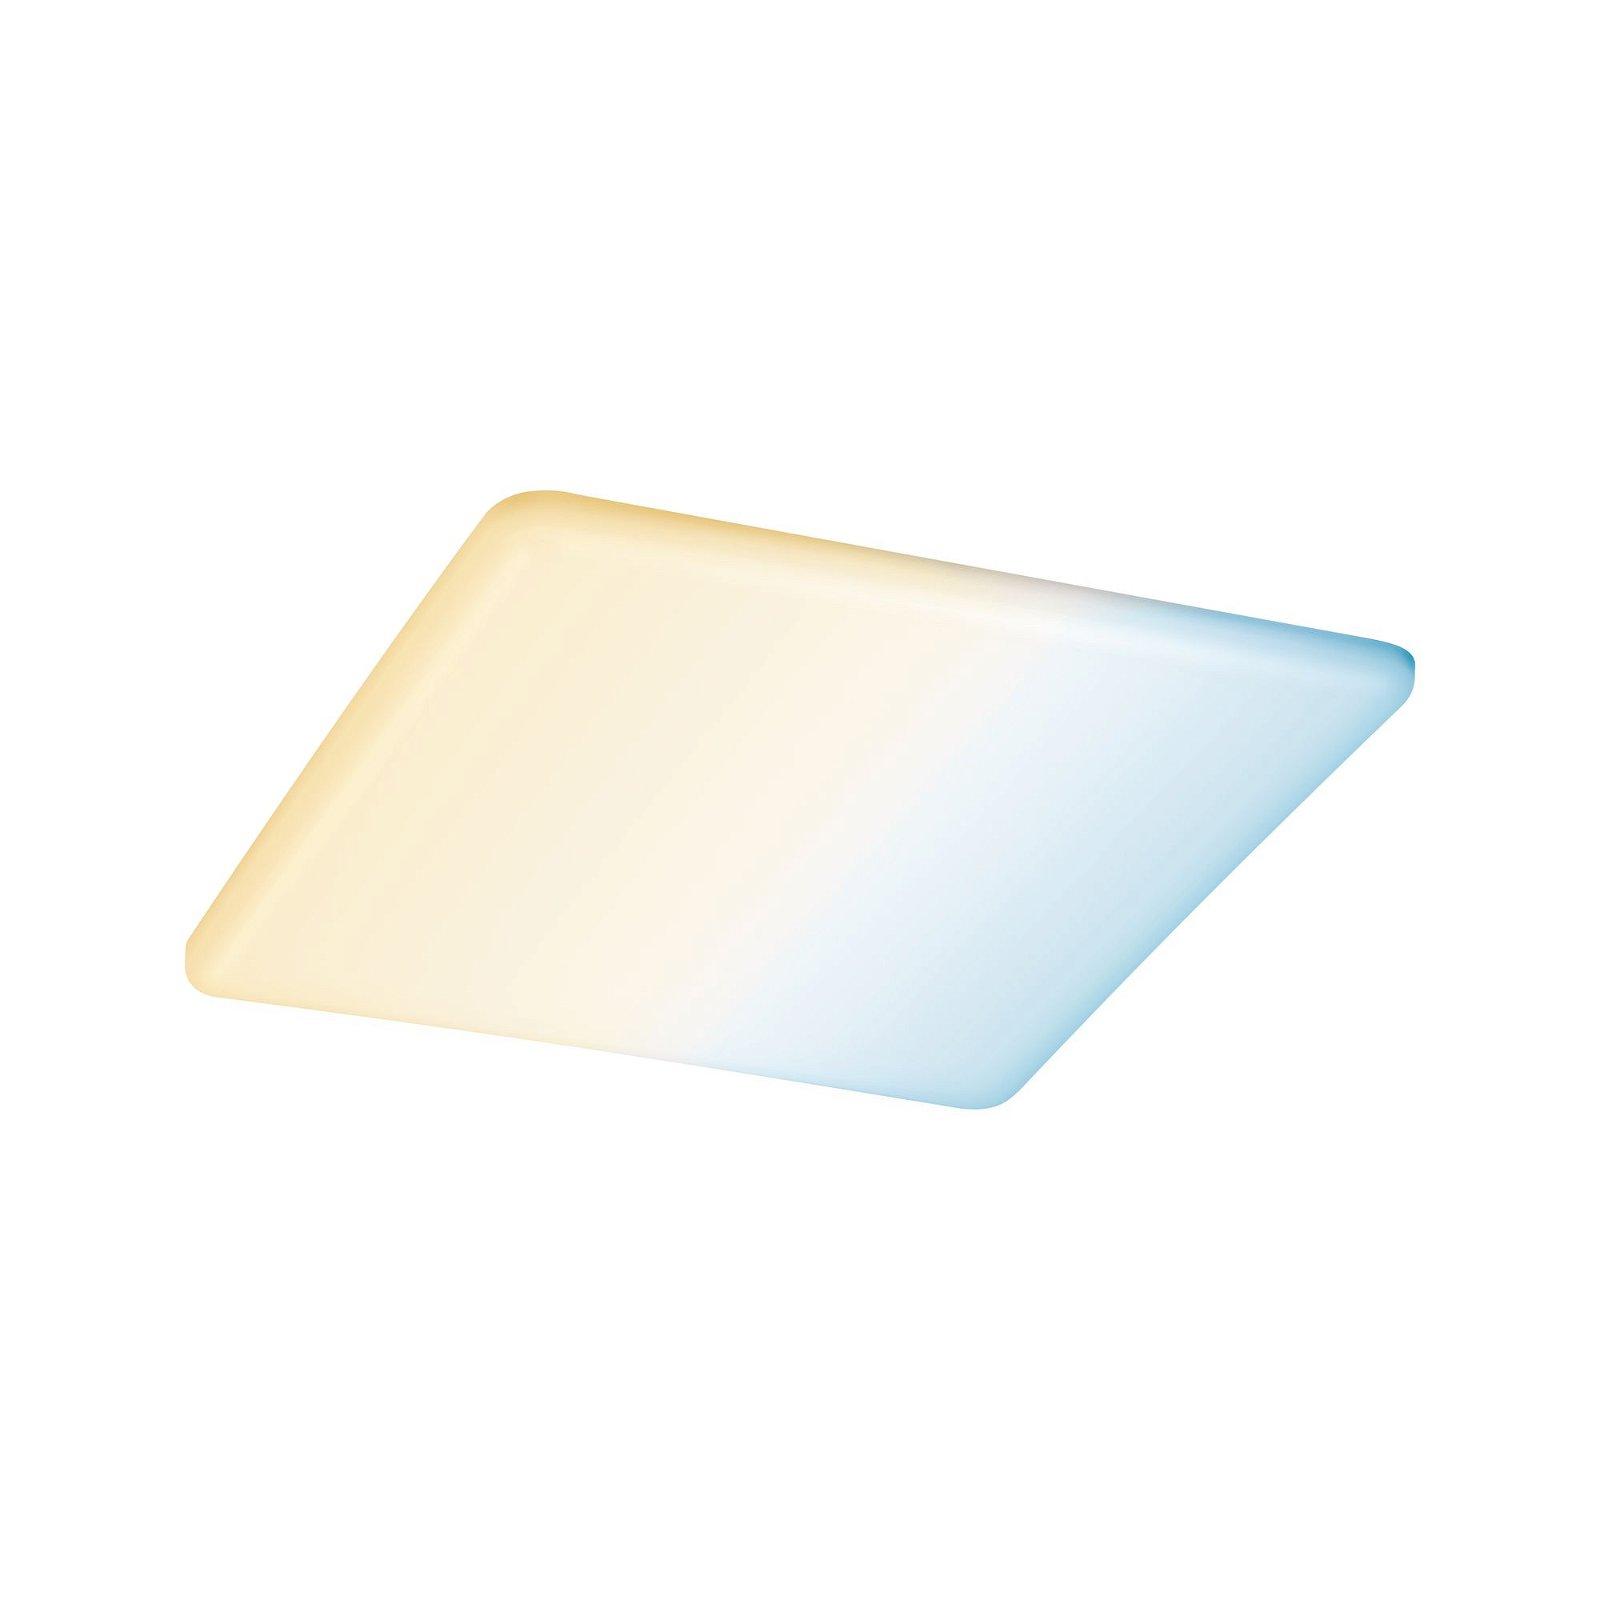 VariFit LED Einbaupanel Smart Home Zigbee Veluna IP44 IP44 eckig 215x215mm 1900lm Tunable White Satin